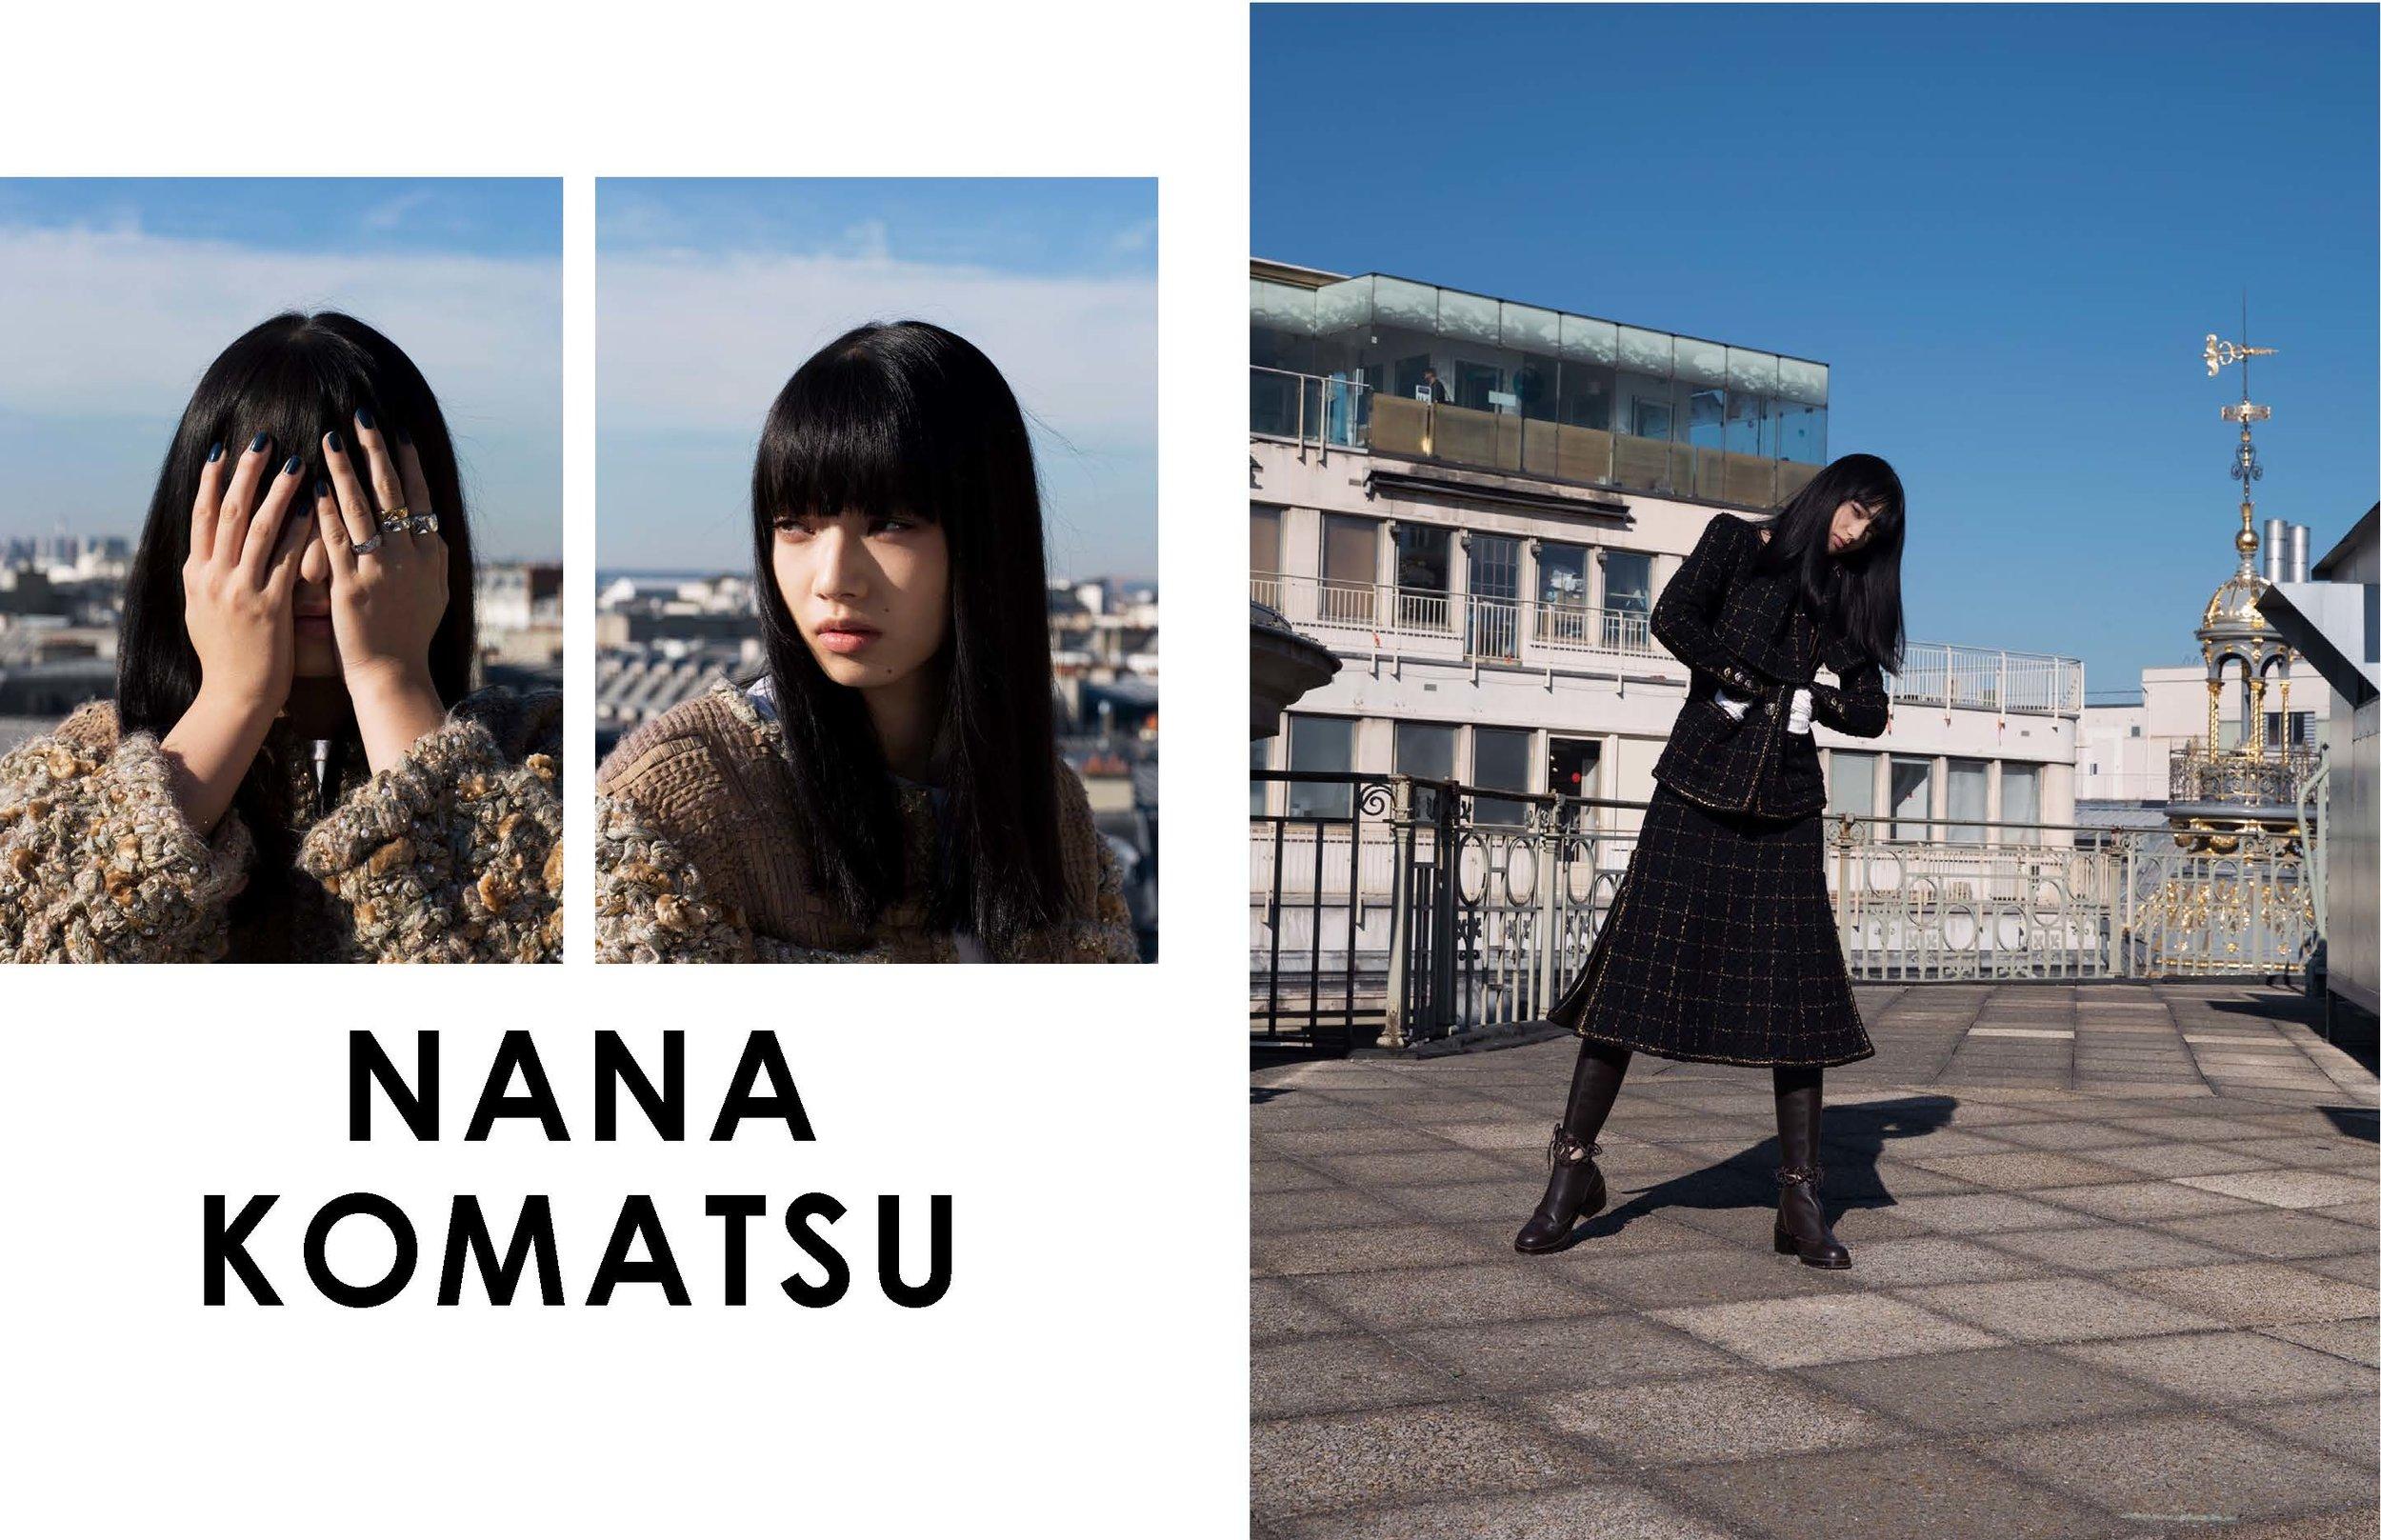 Komatsu Nana X  Austin